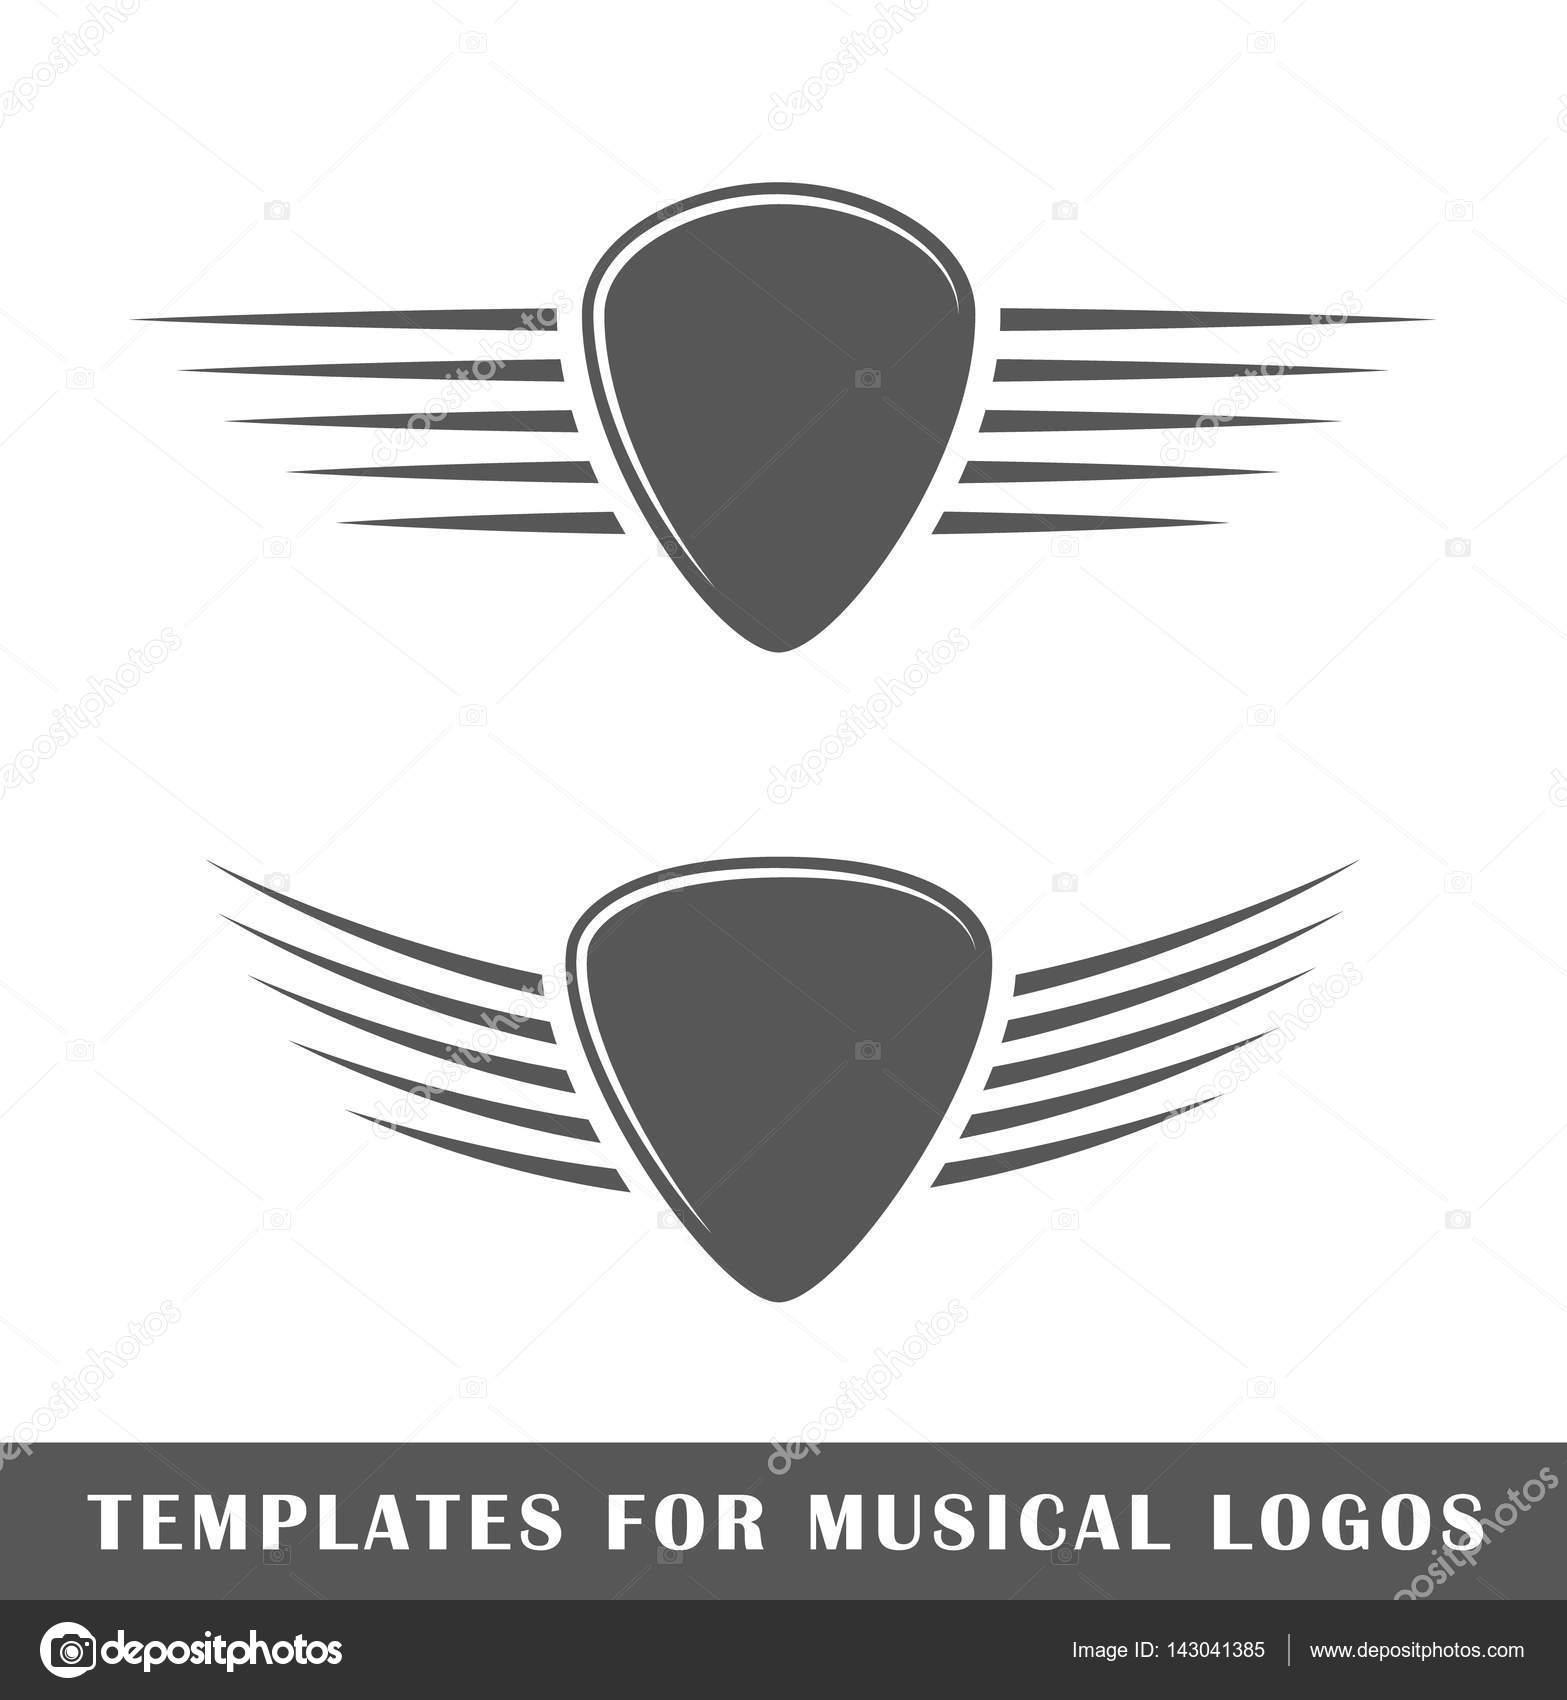 Vorlagen für Musik-labels — Stockvektor © Shabanov_Sergey #143041385